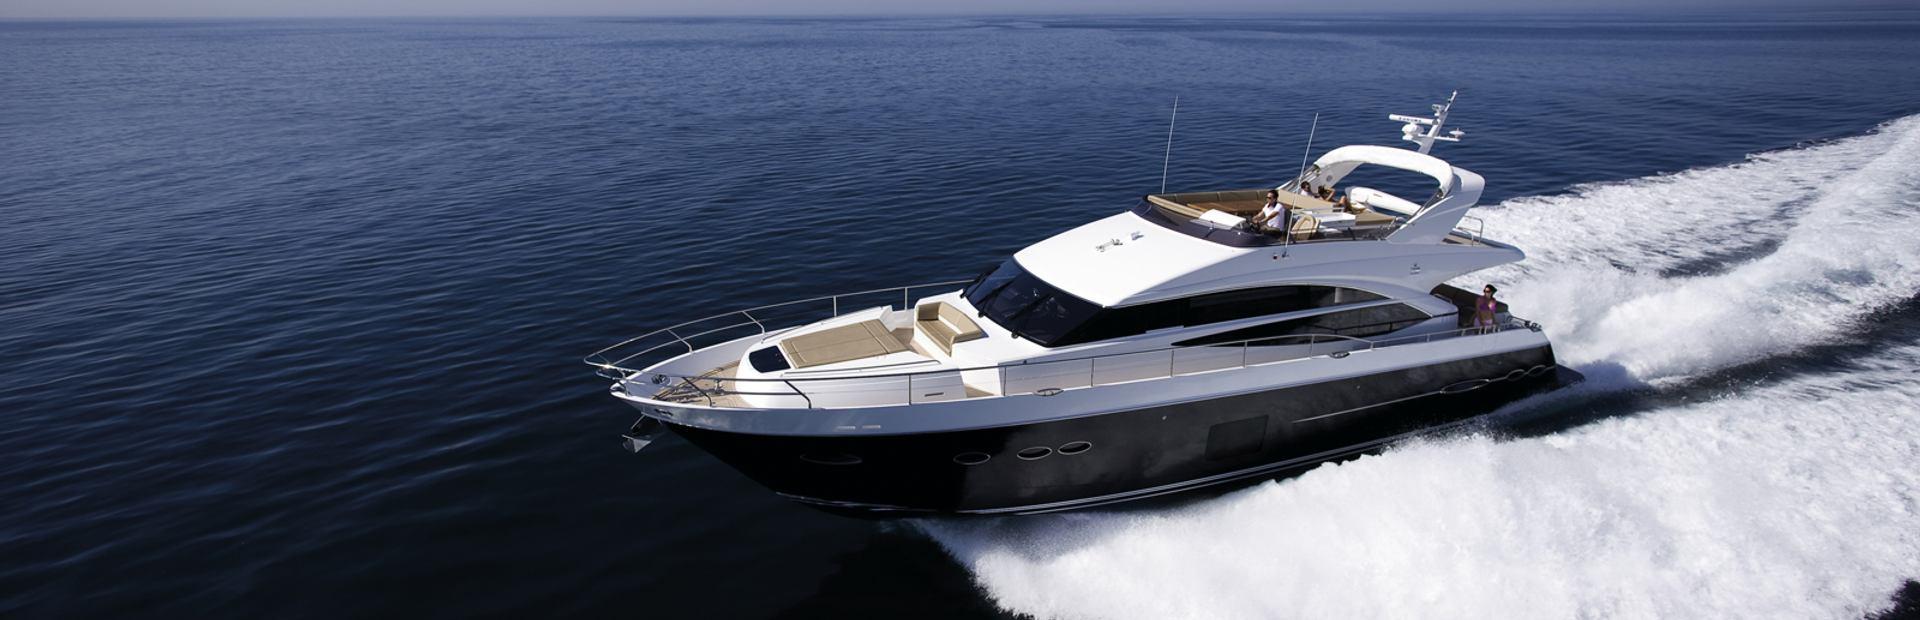 Princess 72 Motor Yacht Yacht Charter